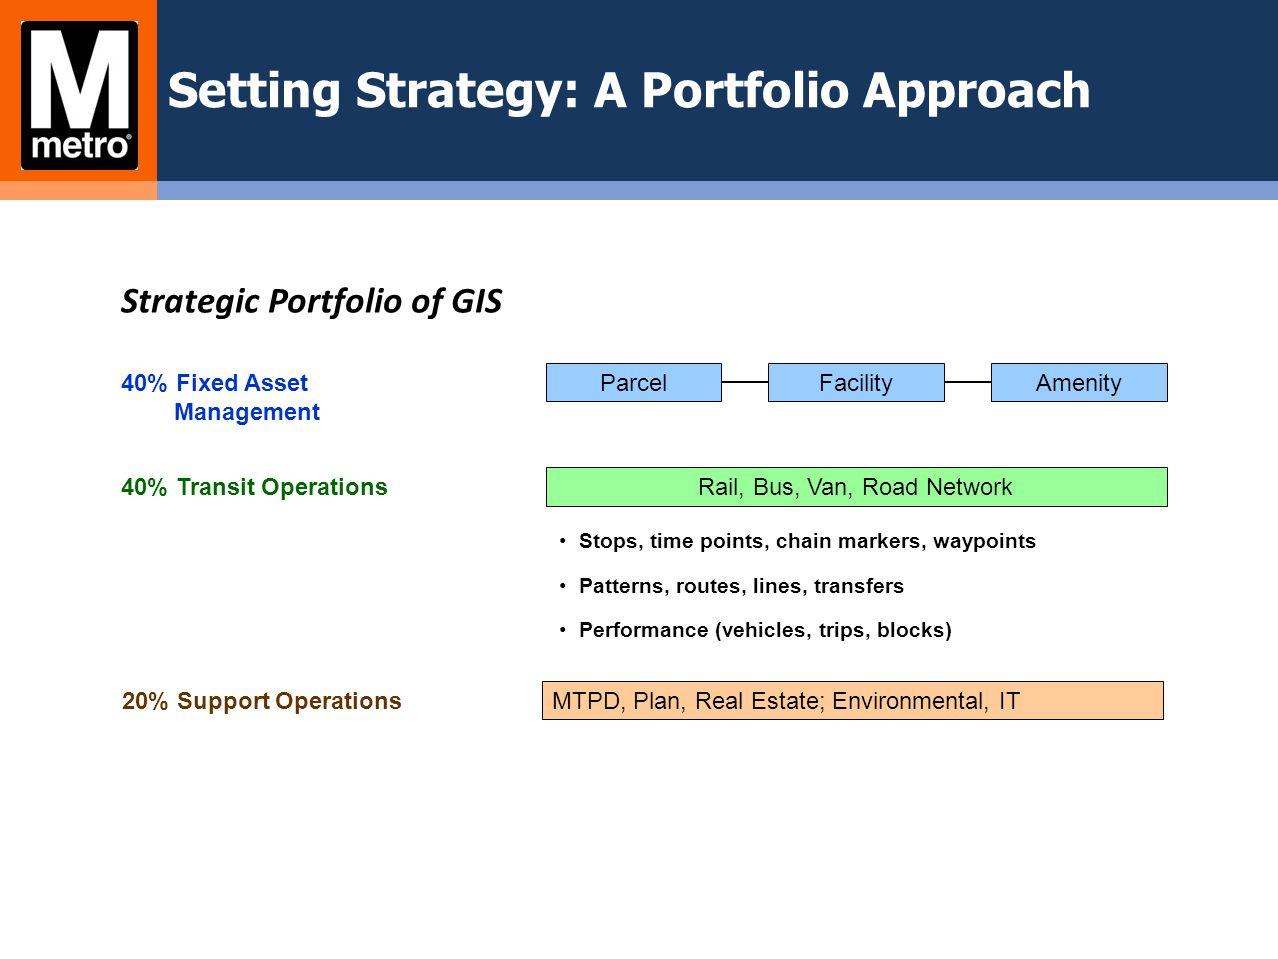 TG 5: Public Website Enhancements Goal: Add bus stop and route maps to wmata.com website.